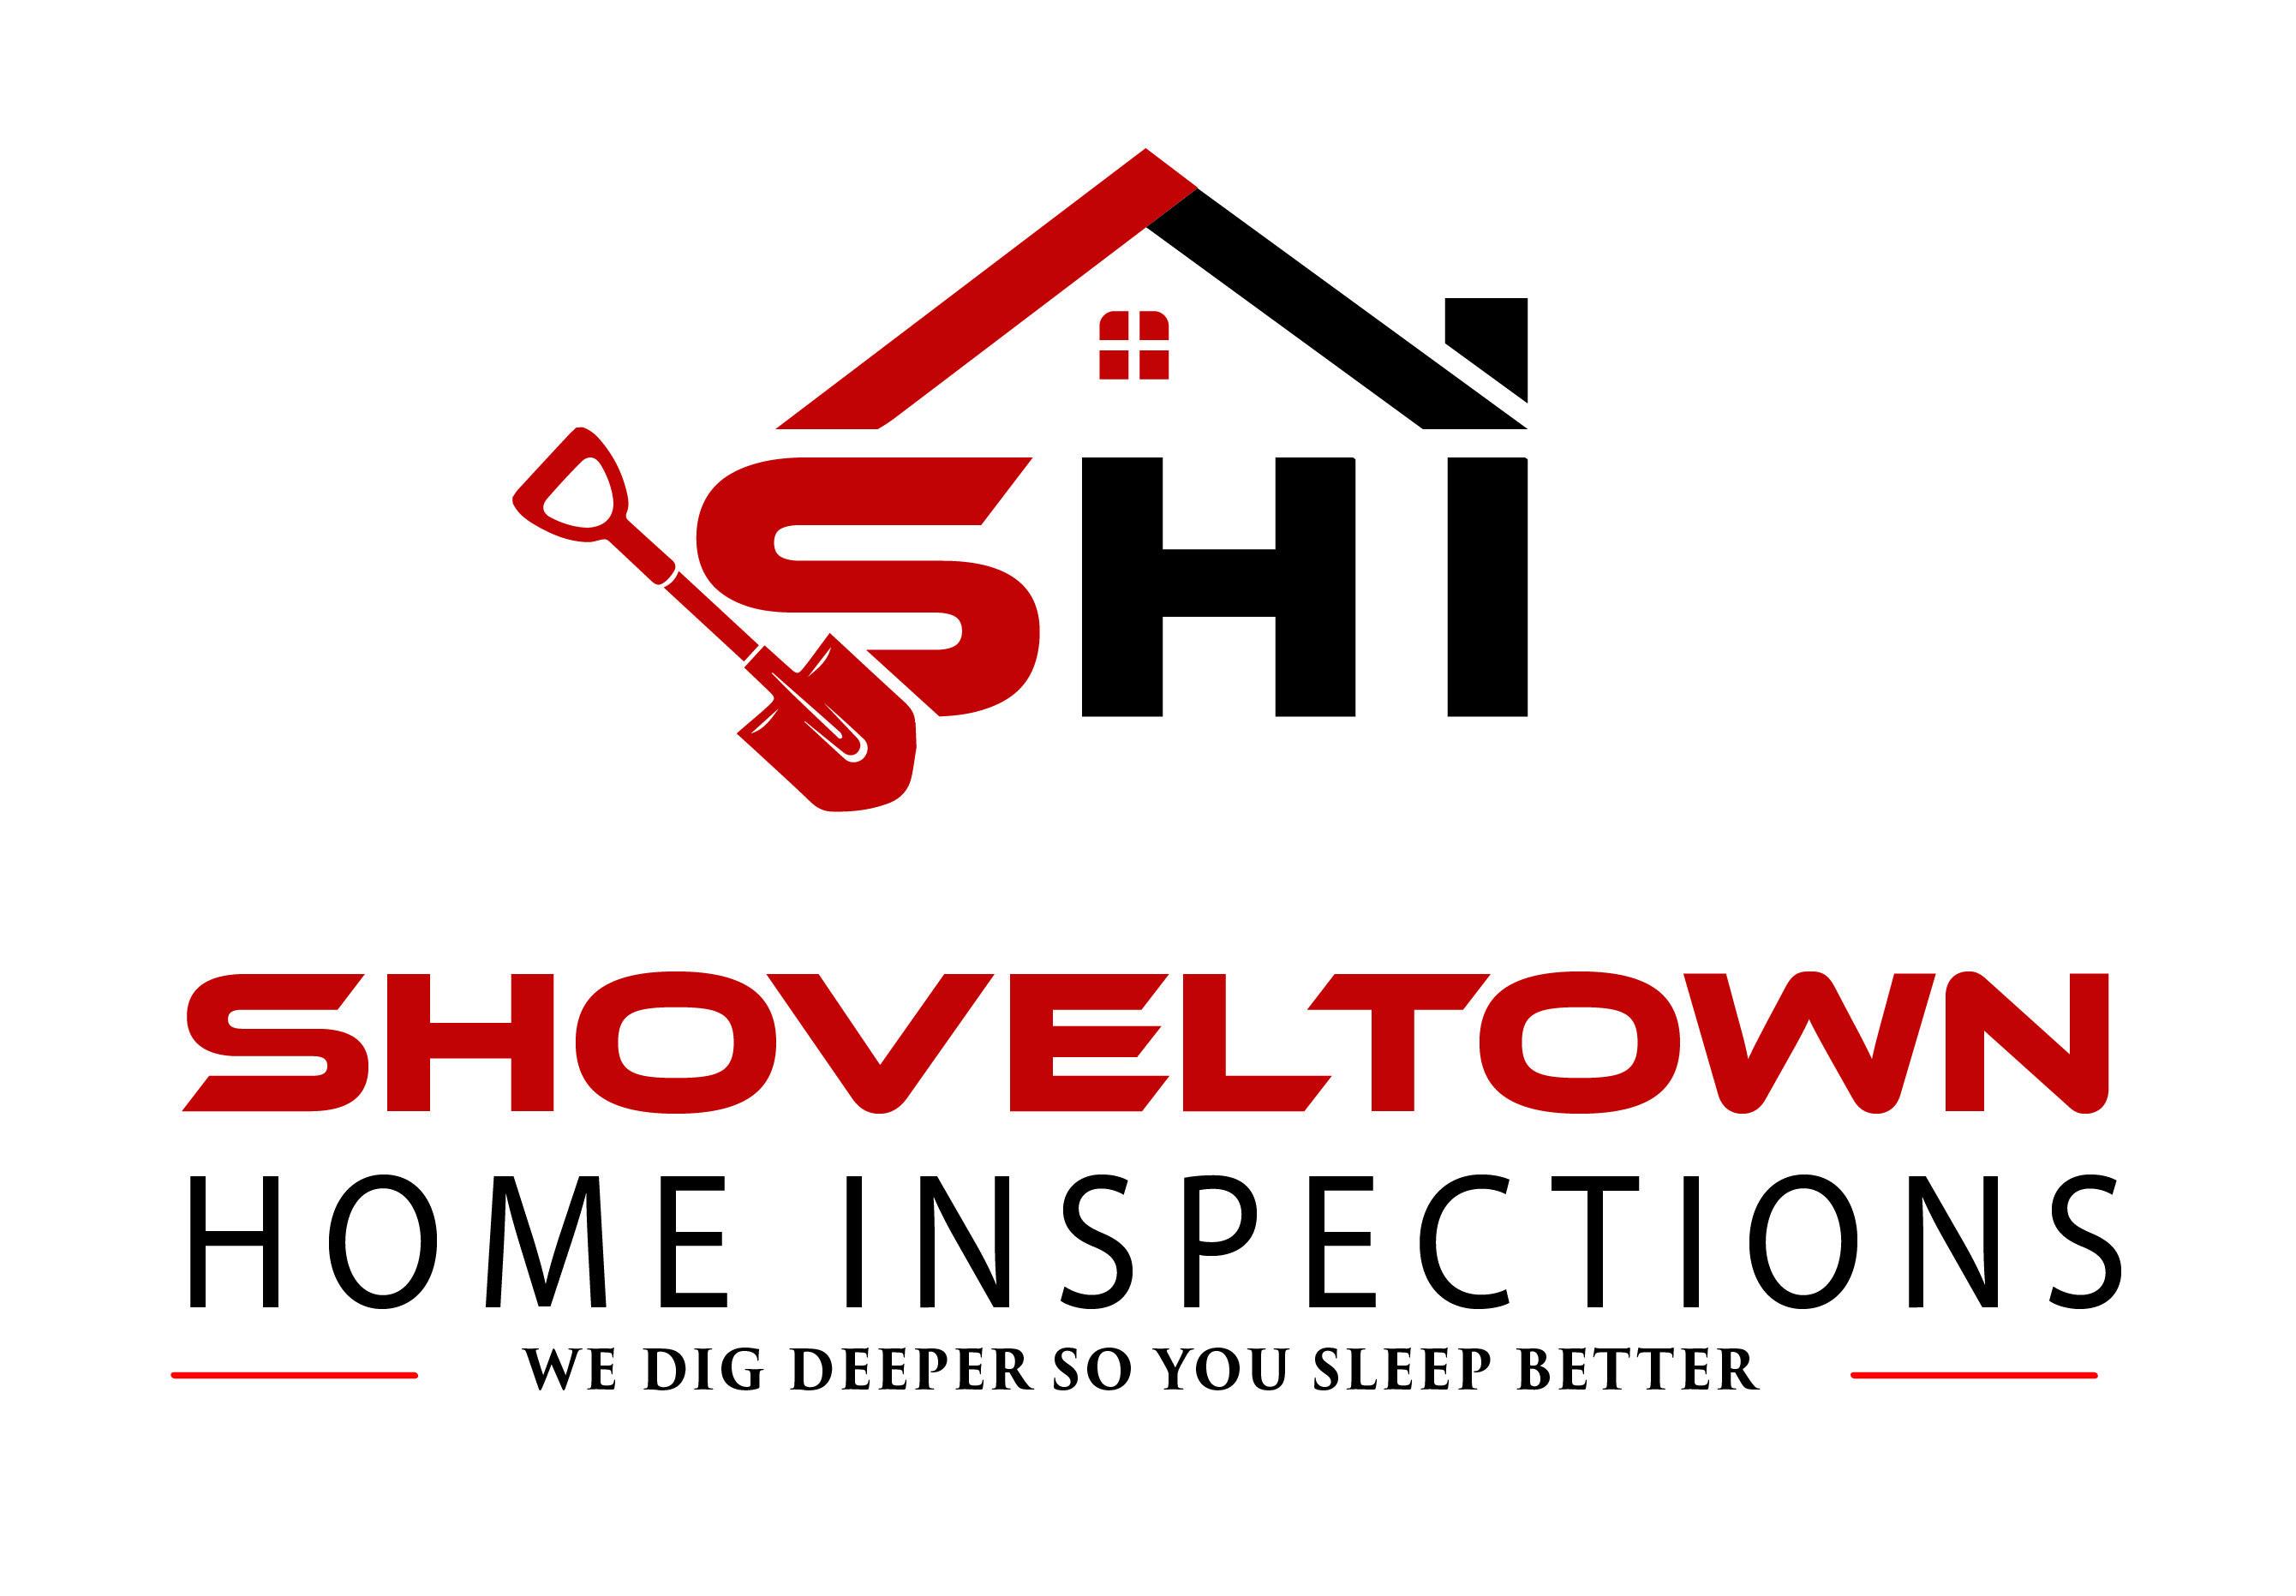 Shoveltown home inspections